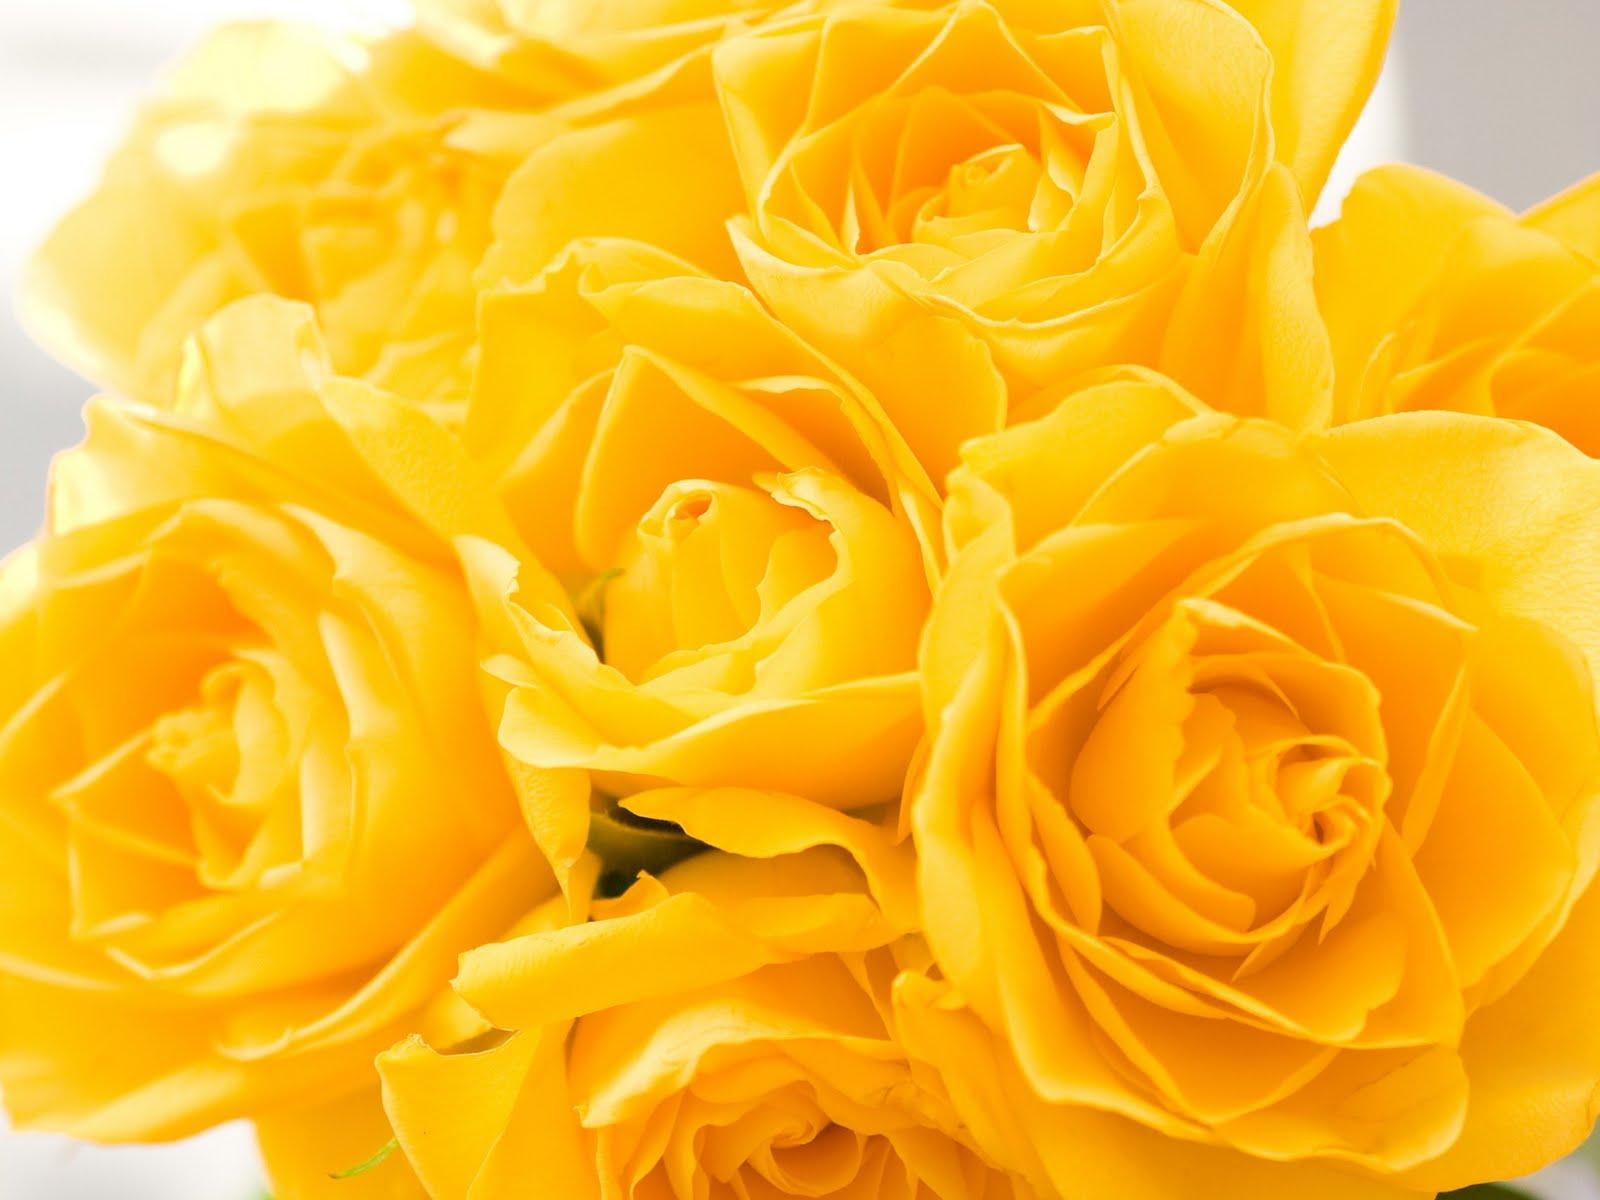 Flores del mundo bellas rosas - Rose flower images full size hd ...